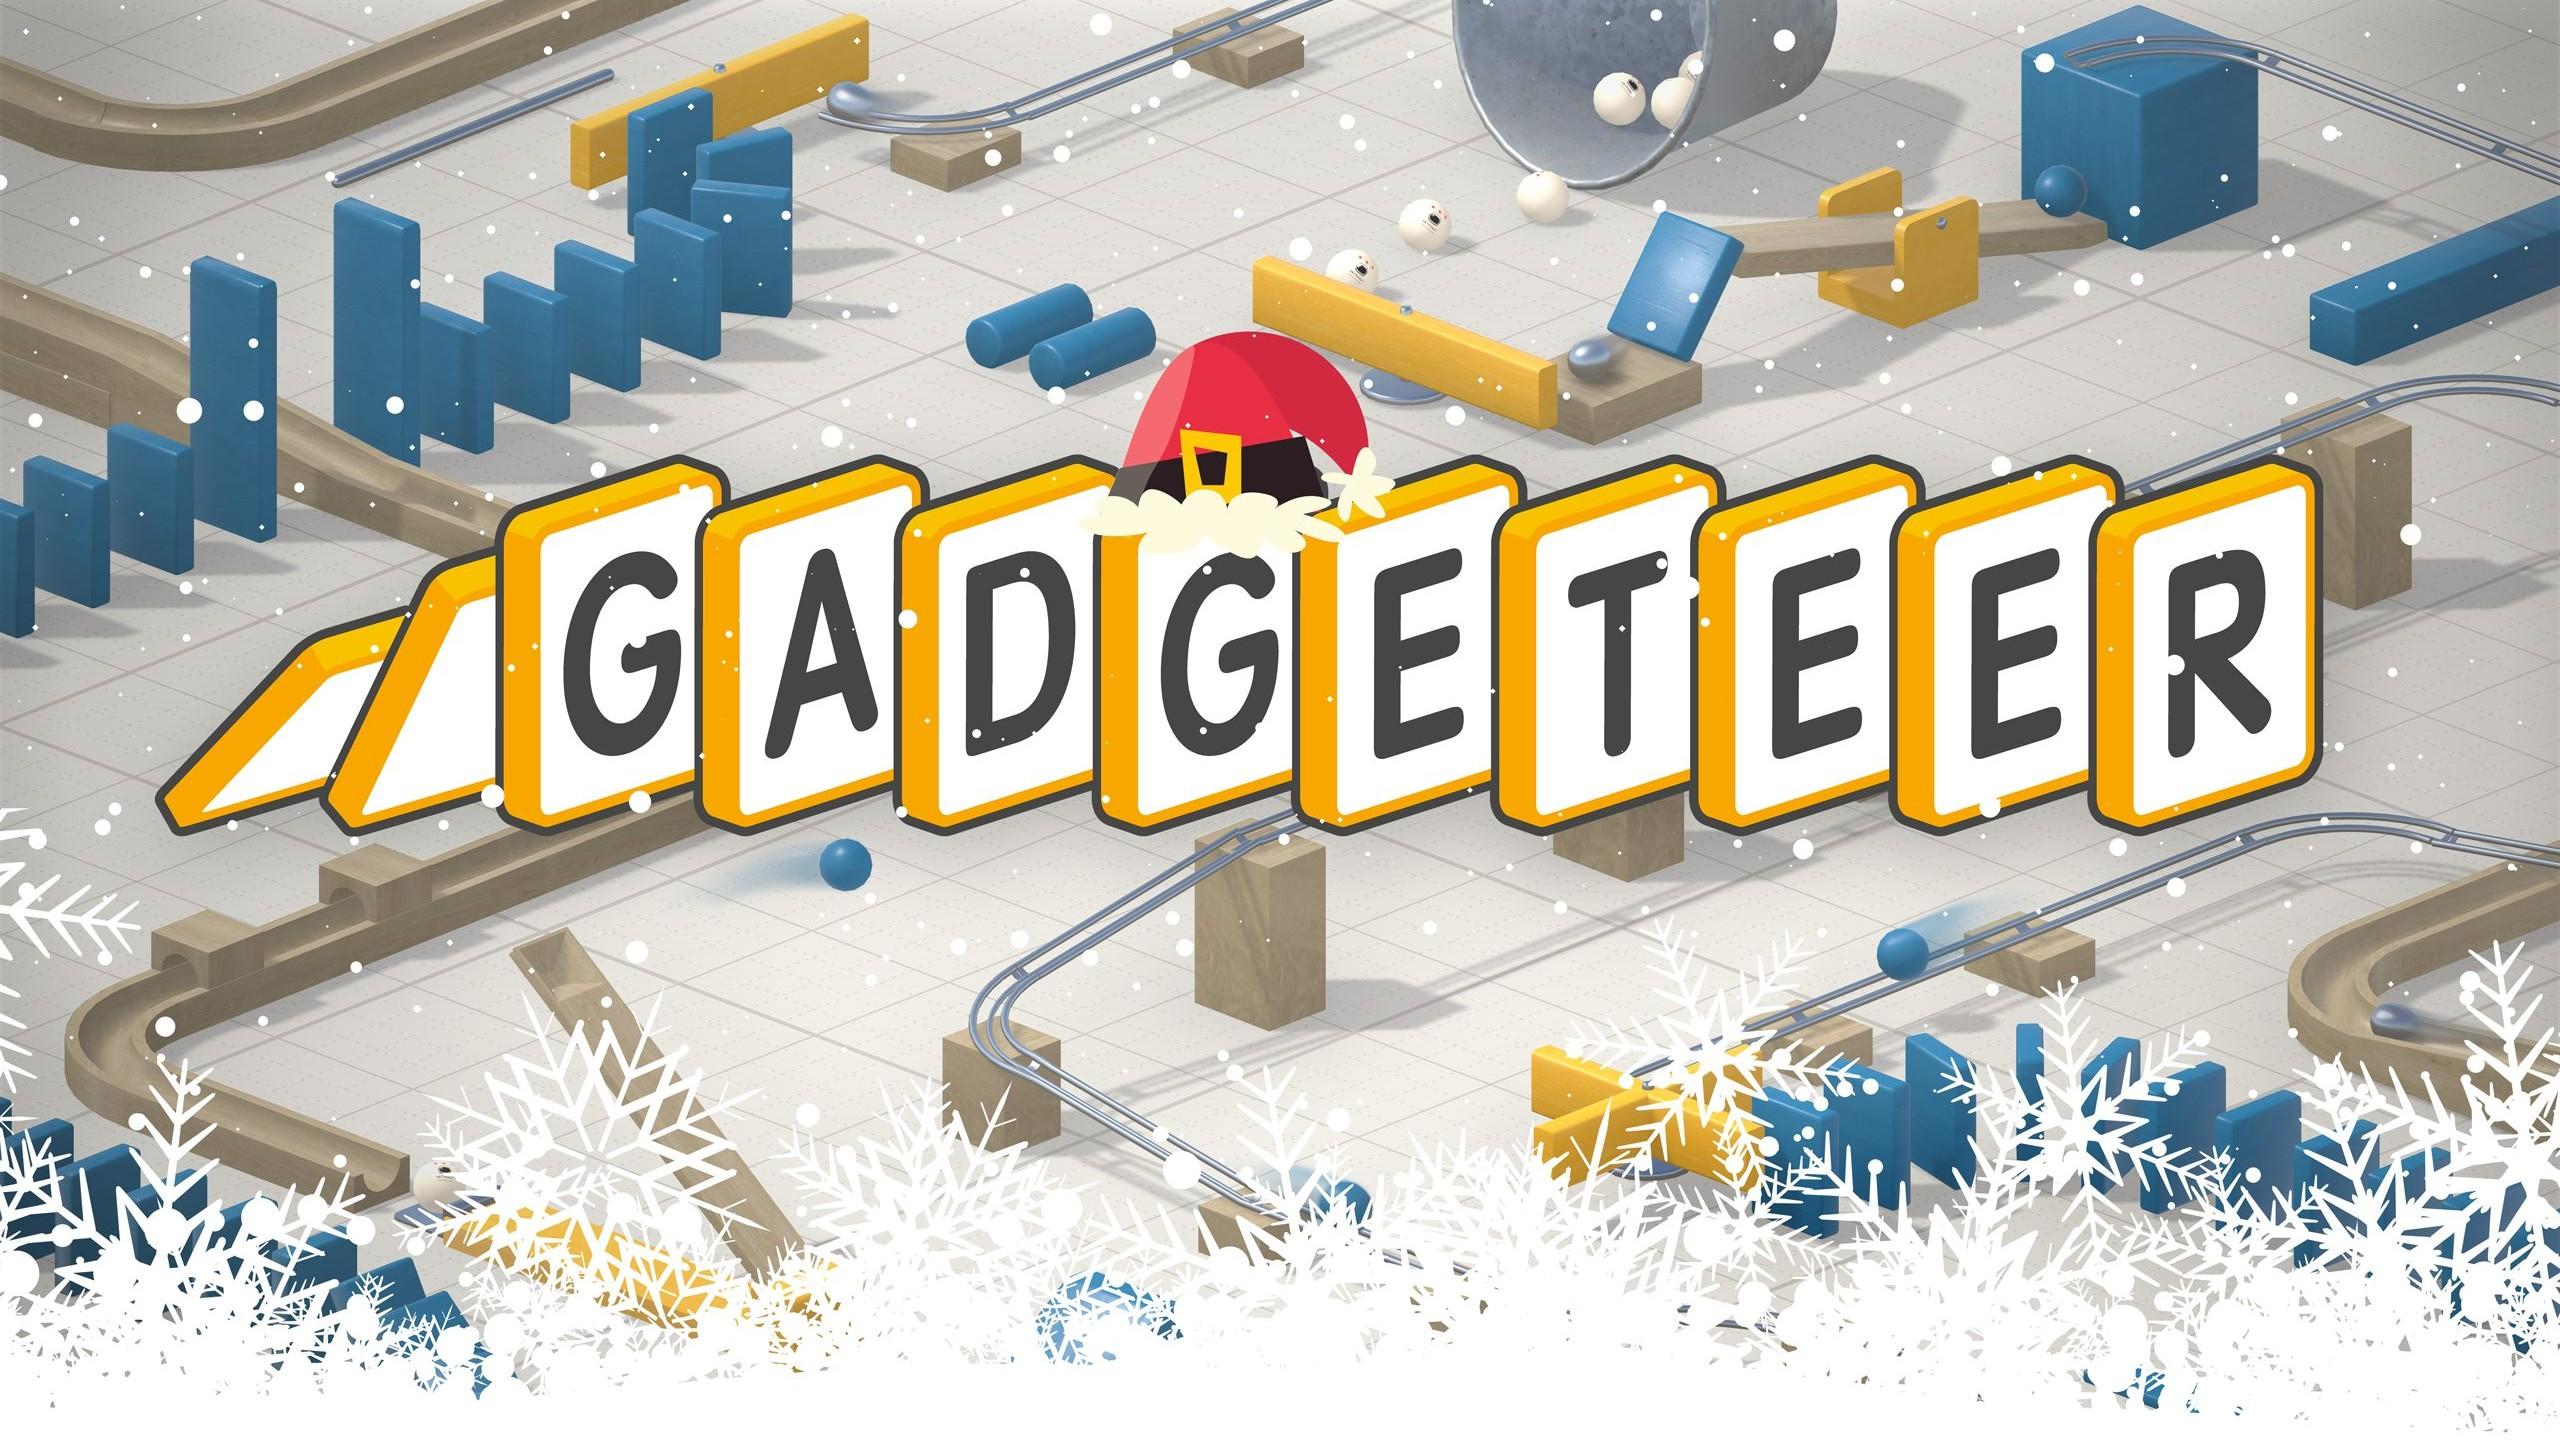 gadgeteer vr happy holidays sale